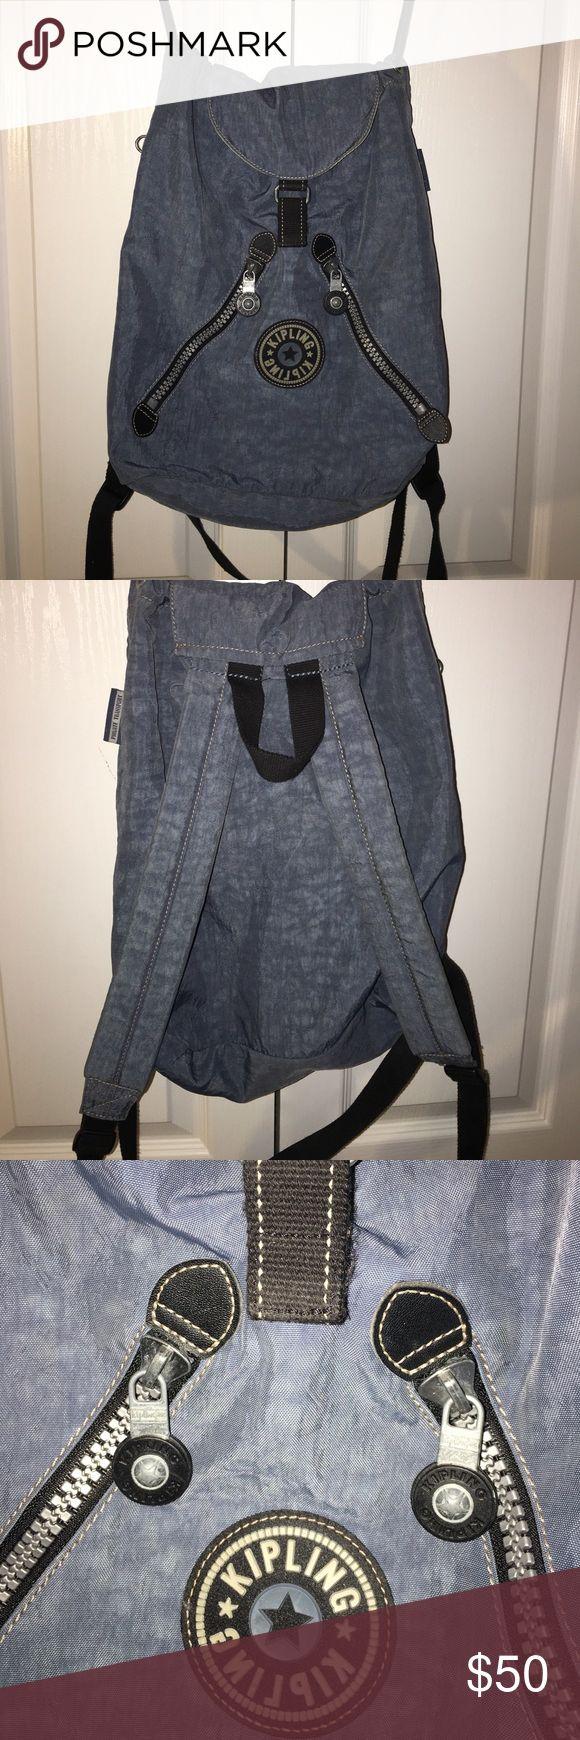 25 best ideas about kipling backpack on pinterest school handbags - Kipling Backpack Blue